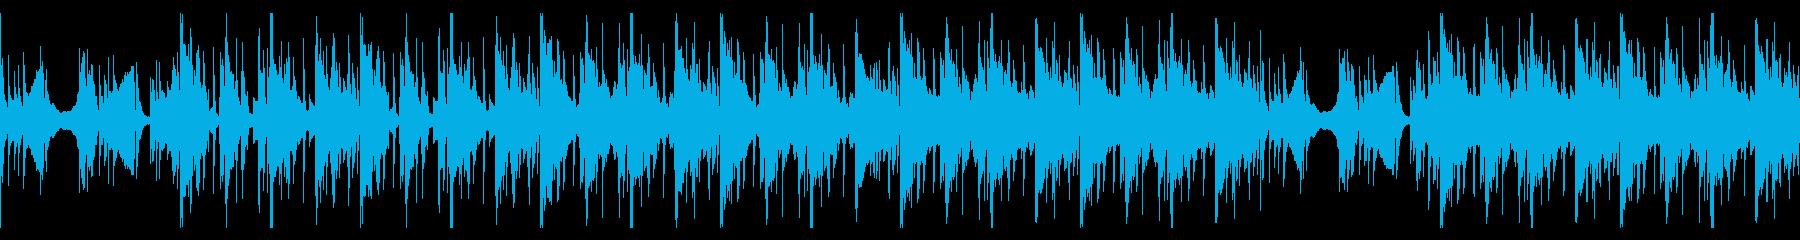 lofiなBGM vlogなどに の再生済みの波形